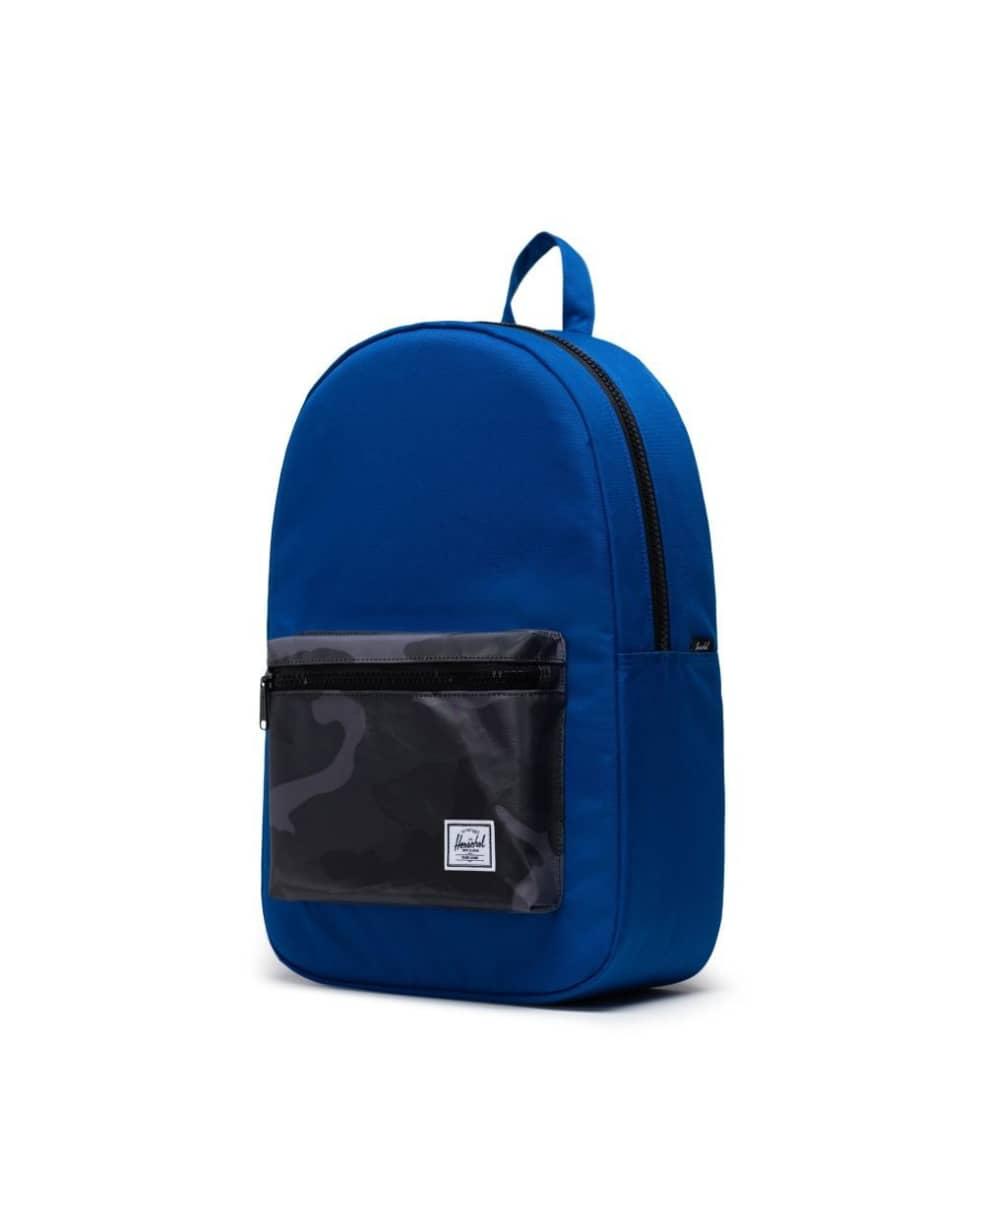 Herschel Settlement Backpack - Surf The Web / Night Camo | Backpack by Herschel Supply Co. 3